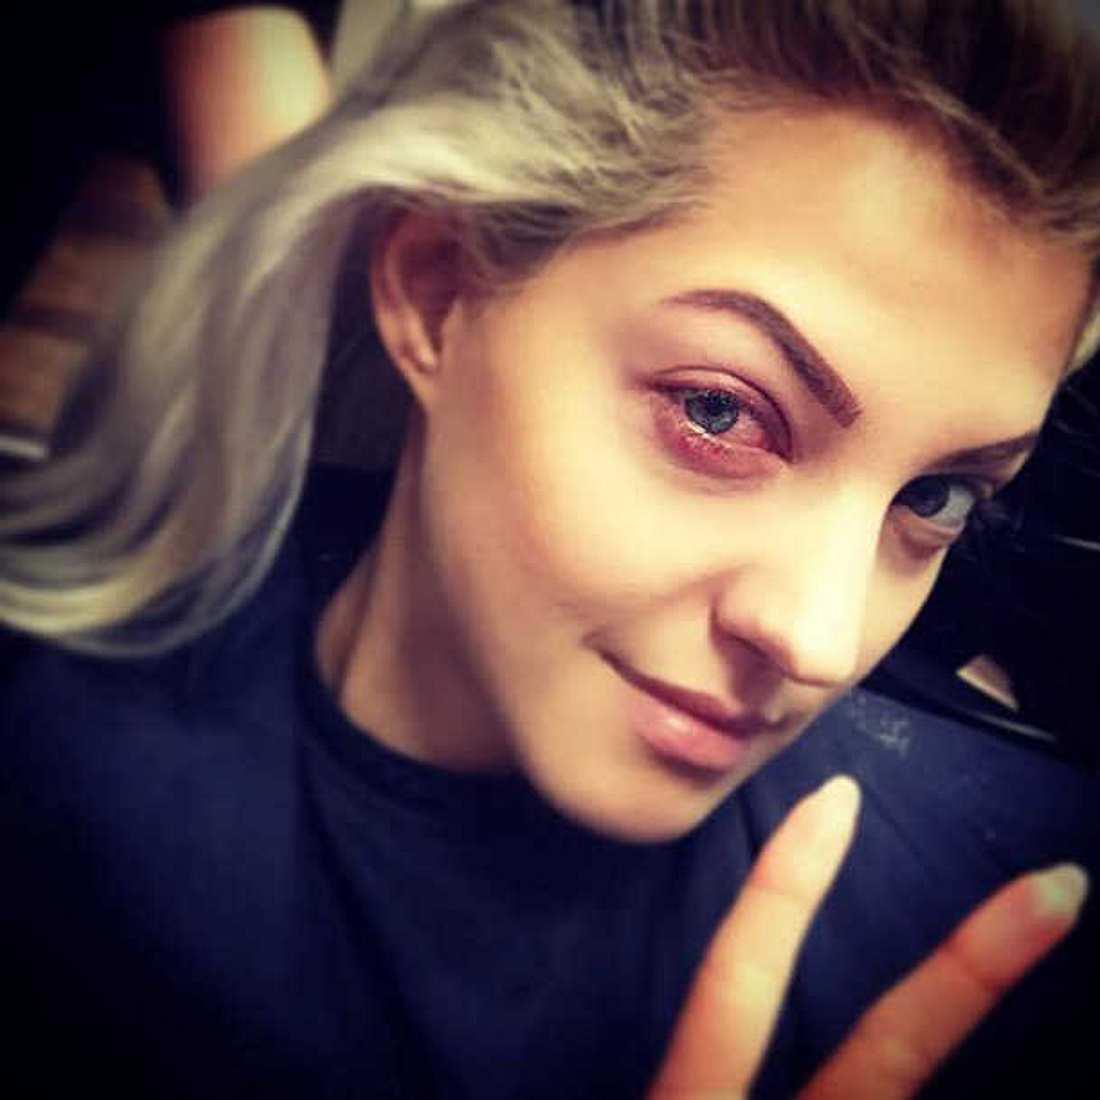 Sarah Nowak schockt mit Matsch-Auge!